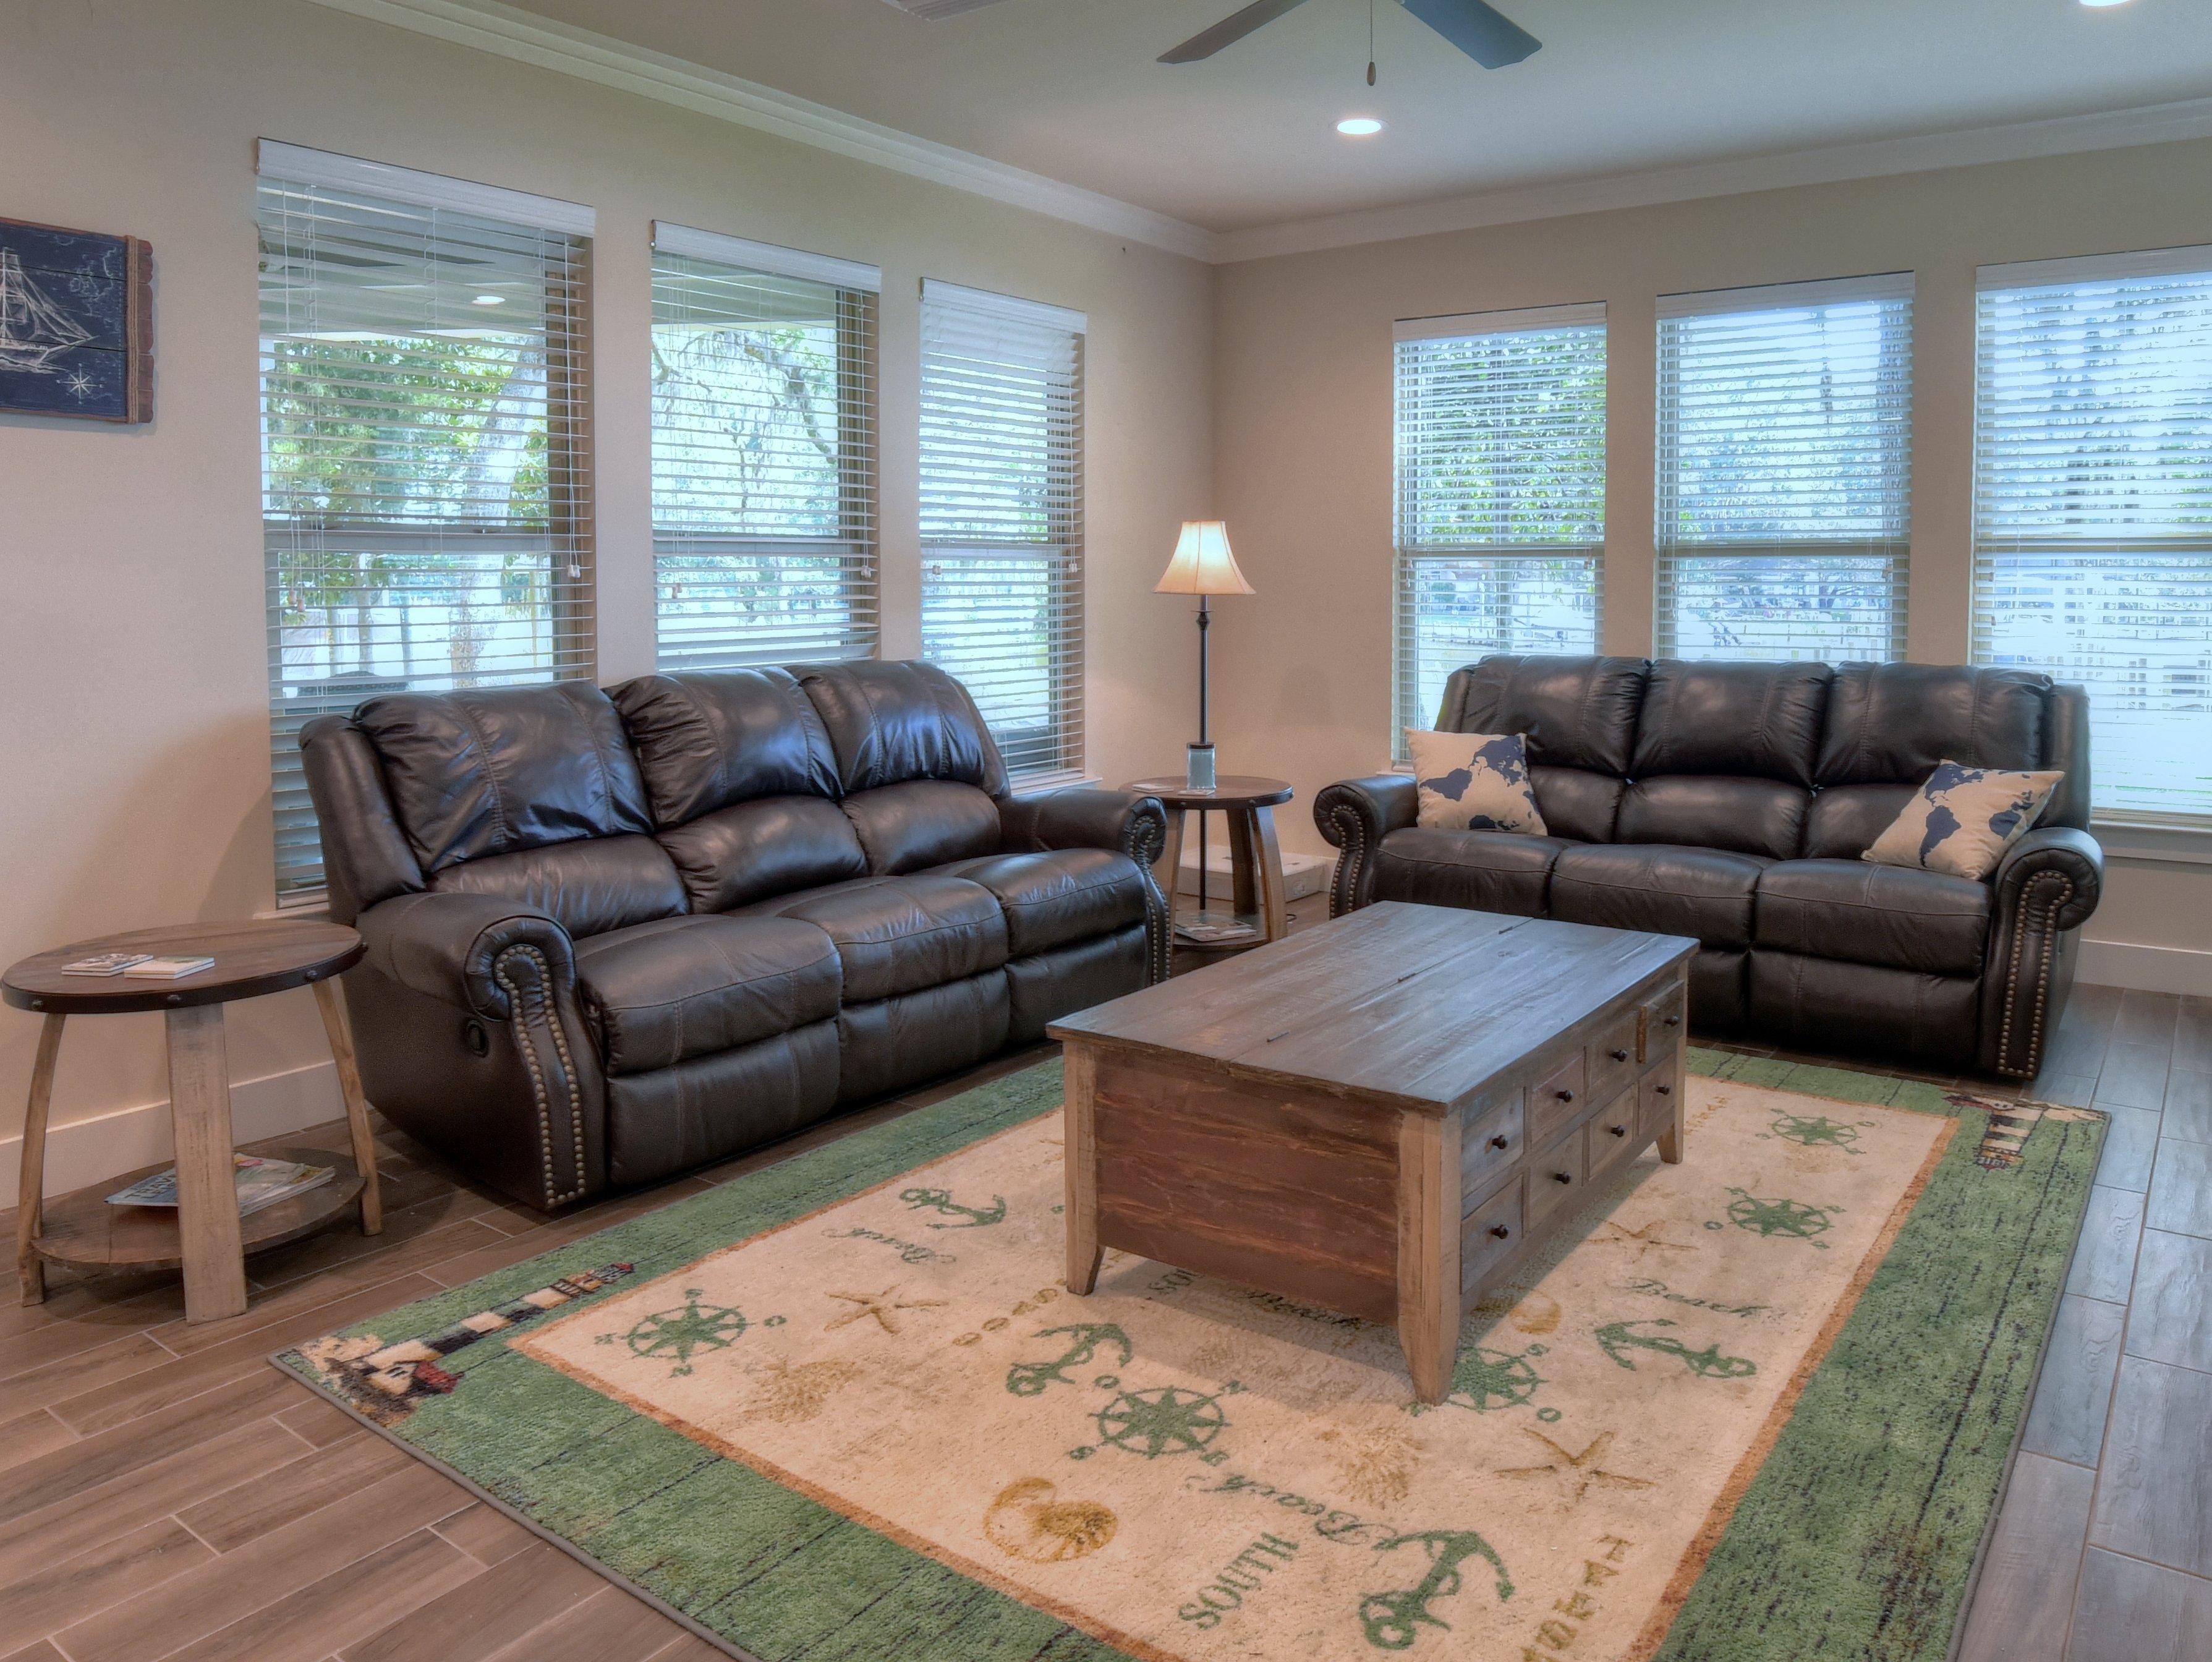 93 Beacon Point Condo rental in Sandestin Rentals ~ Cottages and Villas  in Destin Florida - #7